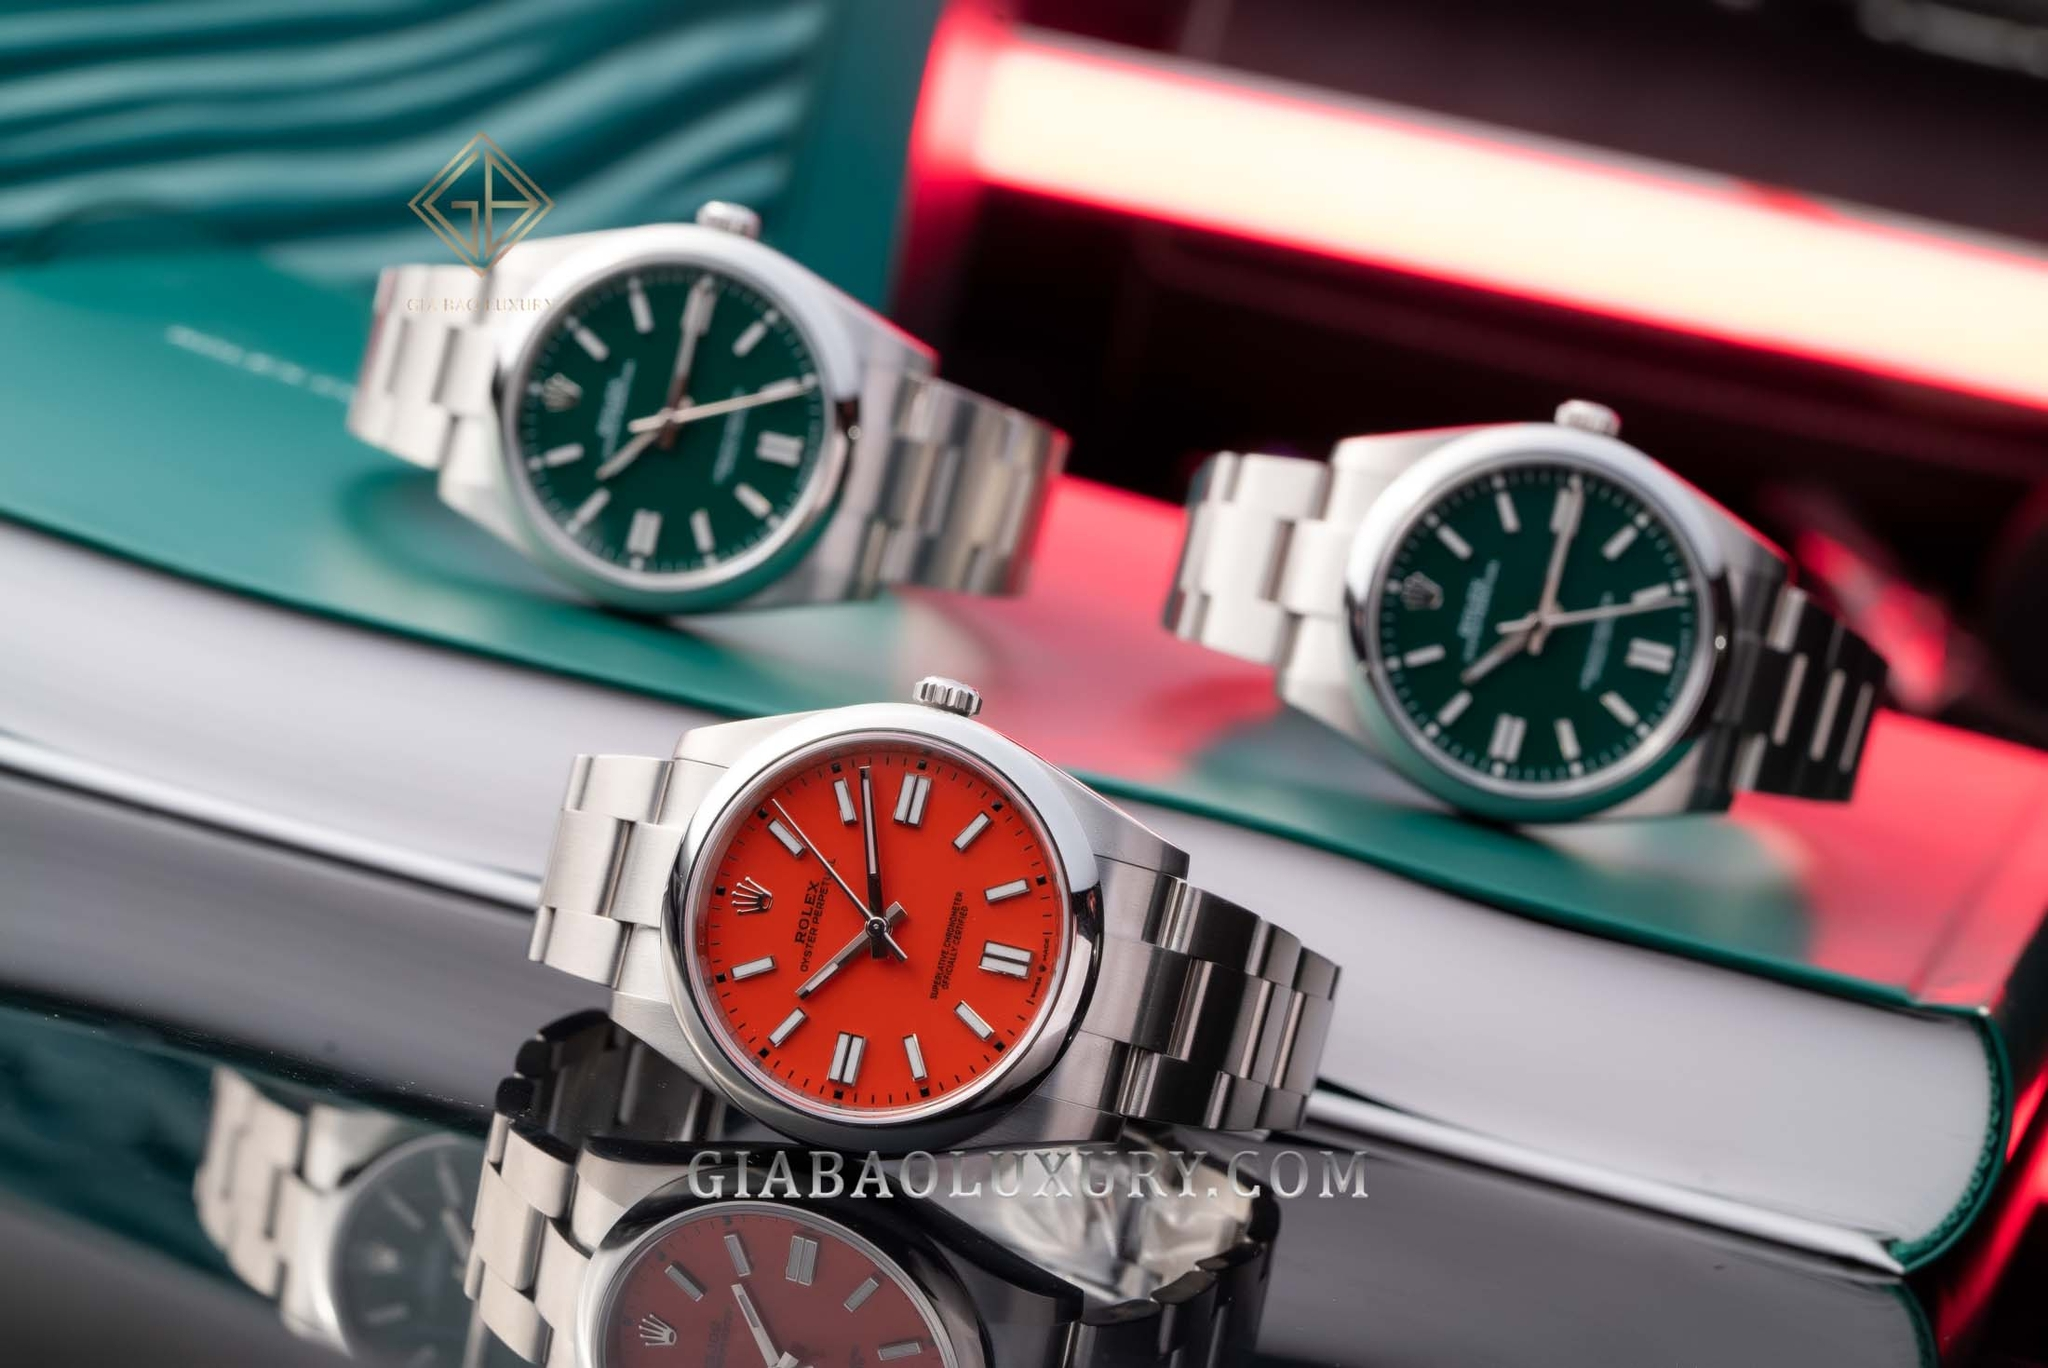 Rolex Oyster Perpetual ra mắt năm 2020